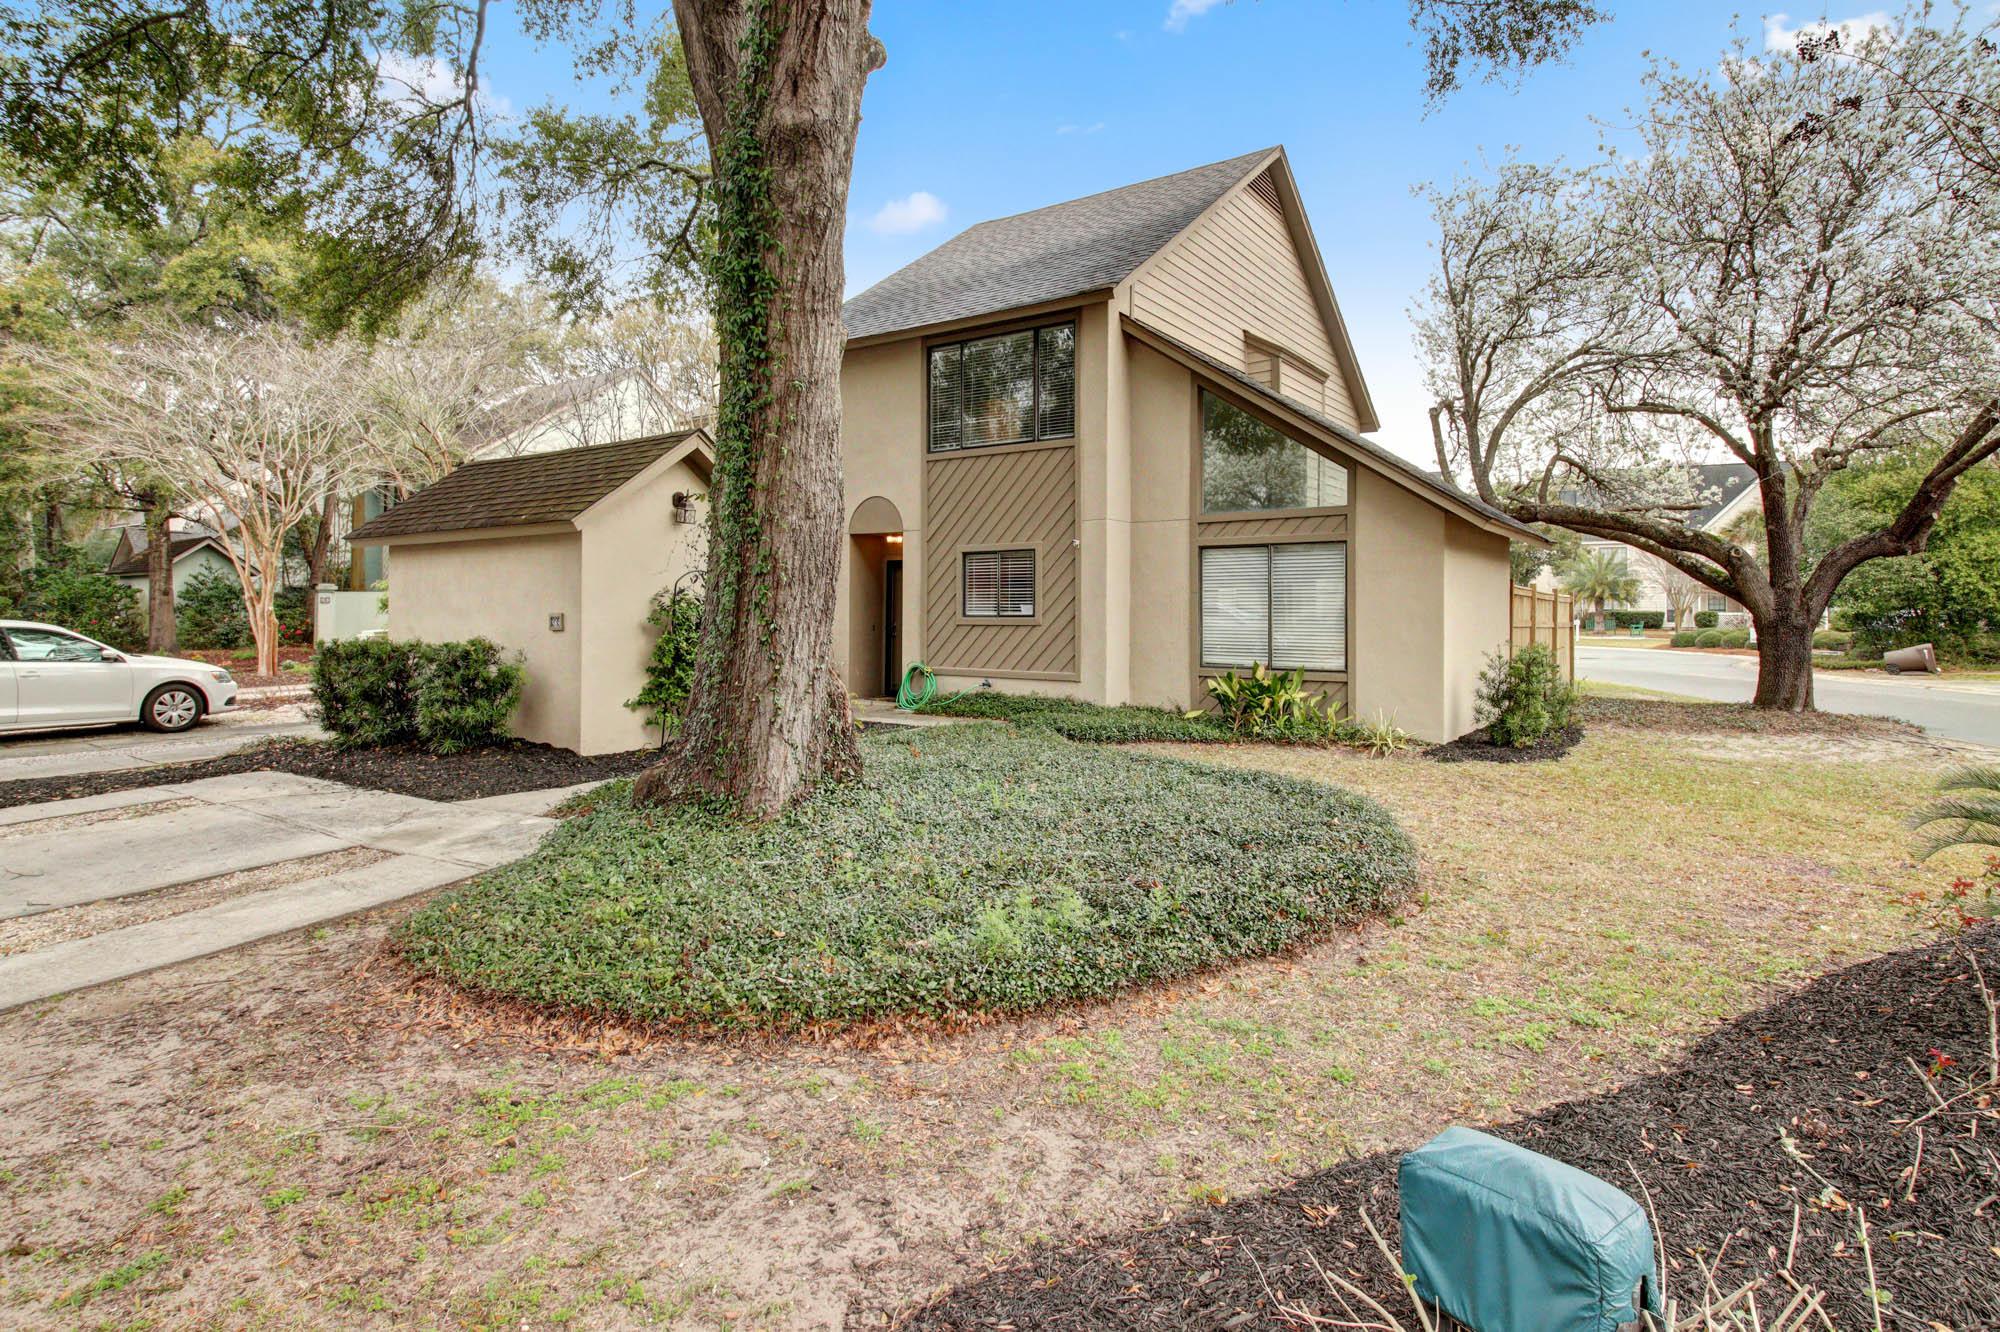 Sandpiper Pointe Homes For Sale - 335 Spoonbill, Mount Pleasant, SC - 24